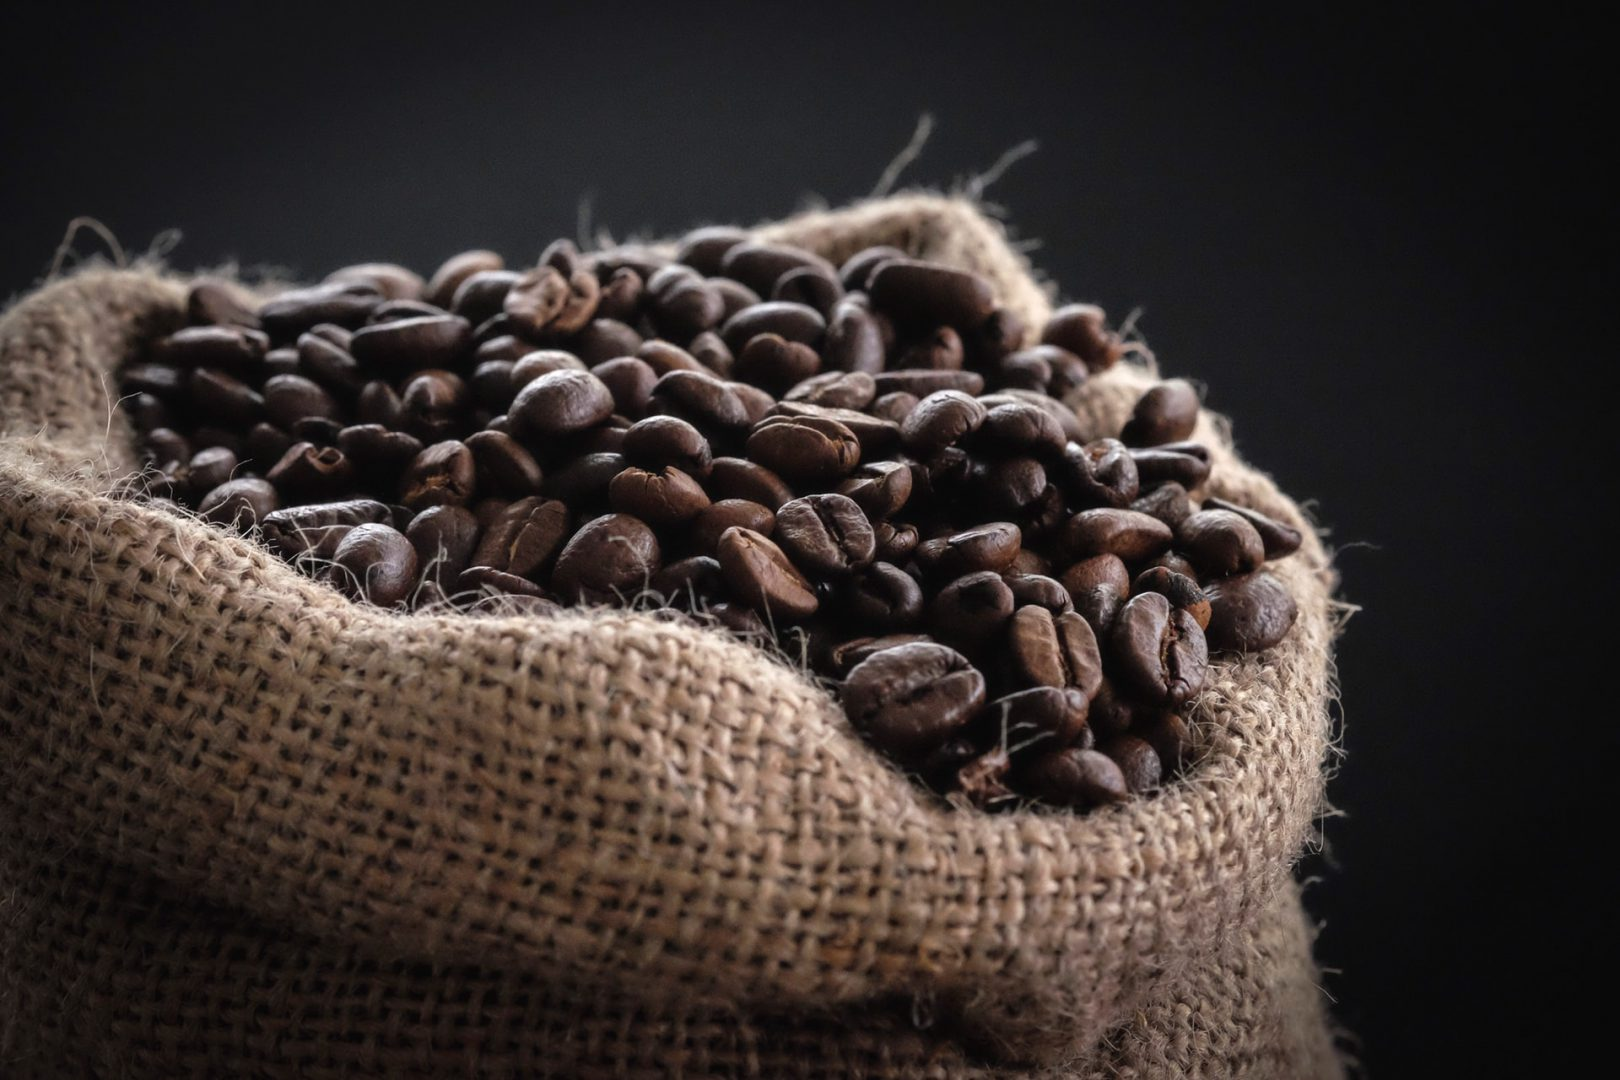 sac grains cafe